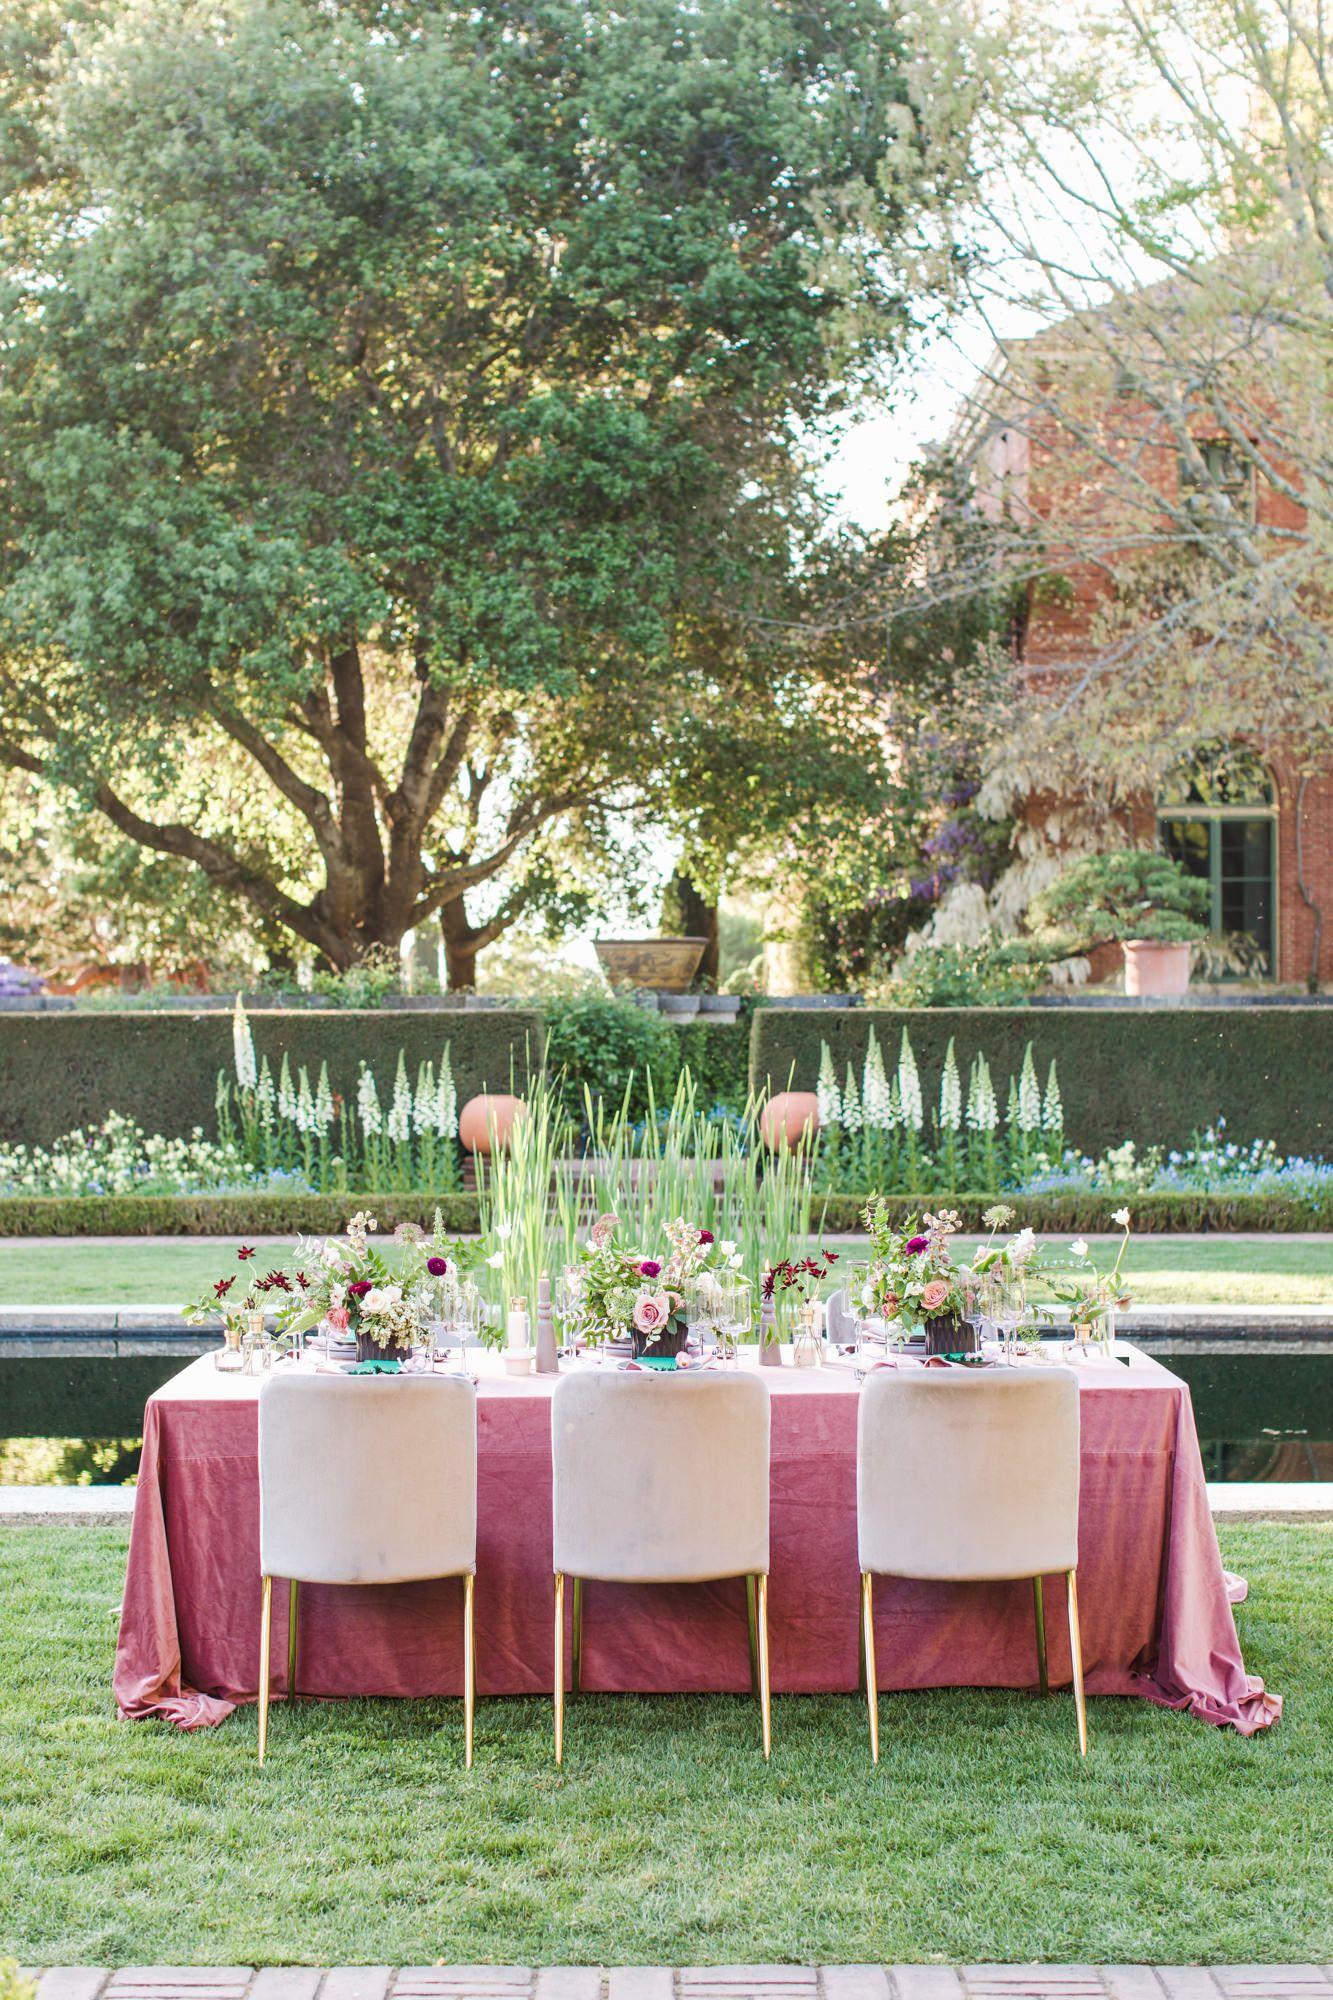 Filoli Garden Wedding Inspiration Colorful Enchanted California Garden Garden Wedding California Romantic Garden Wedding Garden Wedding Inspiration